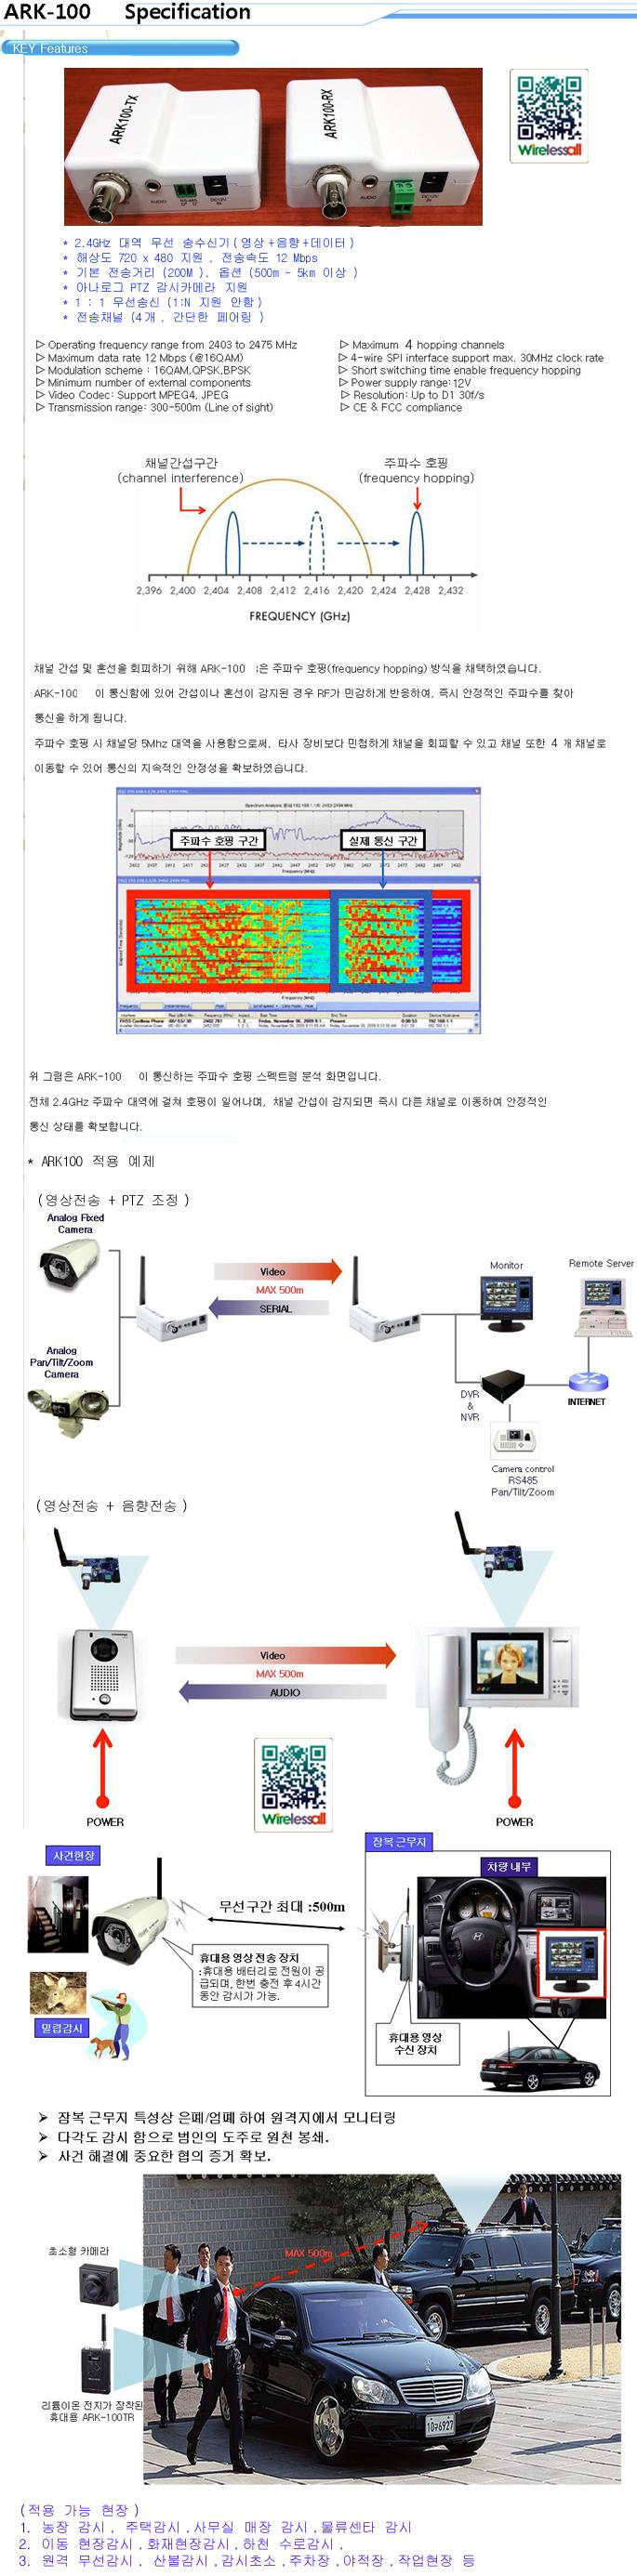 Arkwave ARK-100